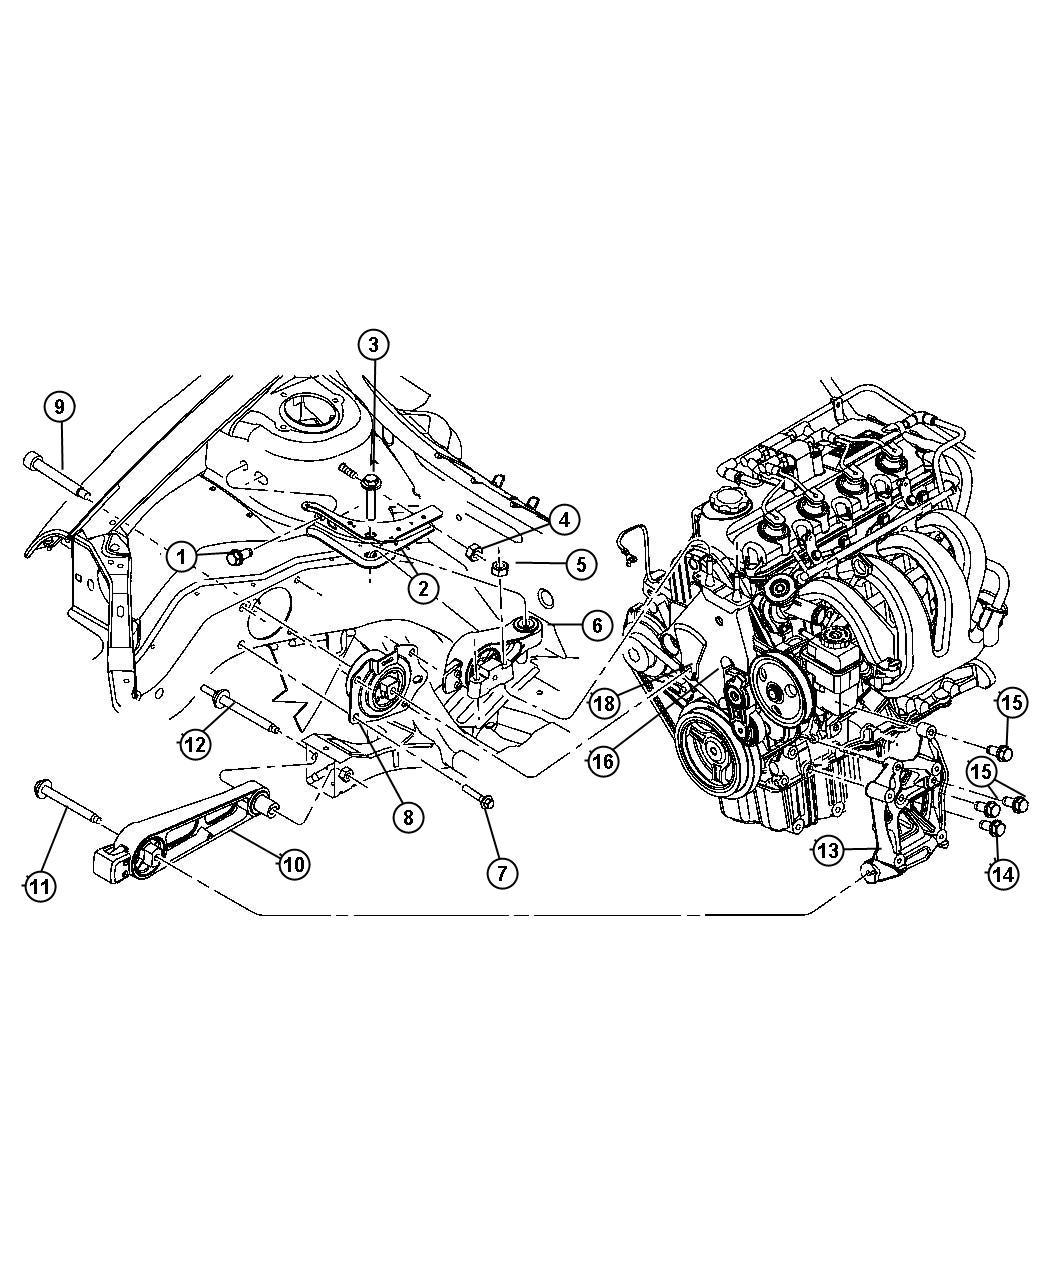 Dodge Neon Isolator Strut Engine Mount Torque Reaction